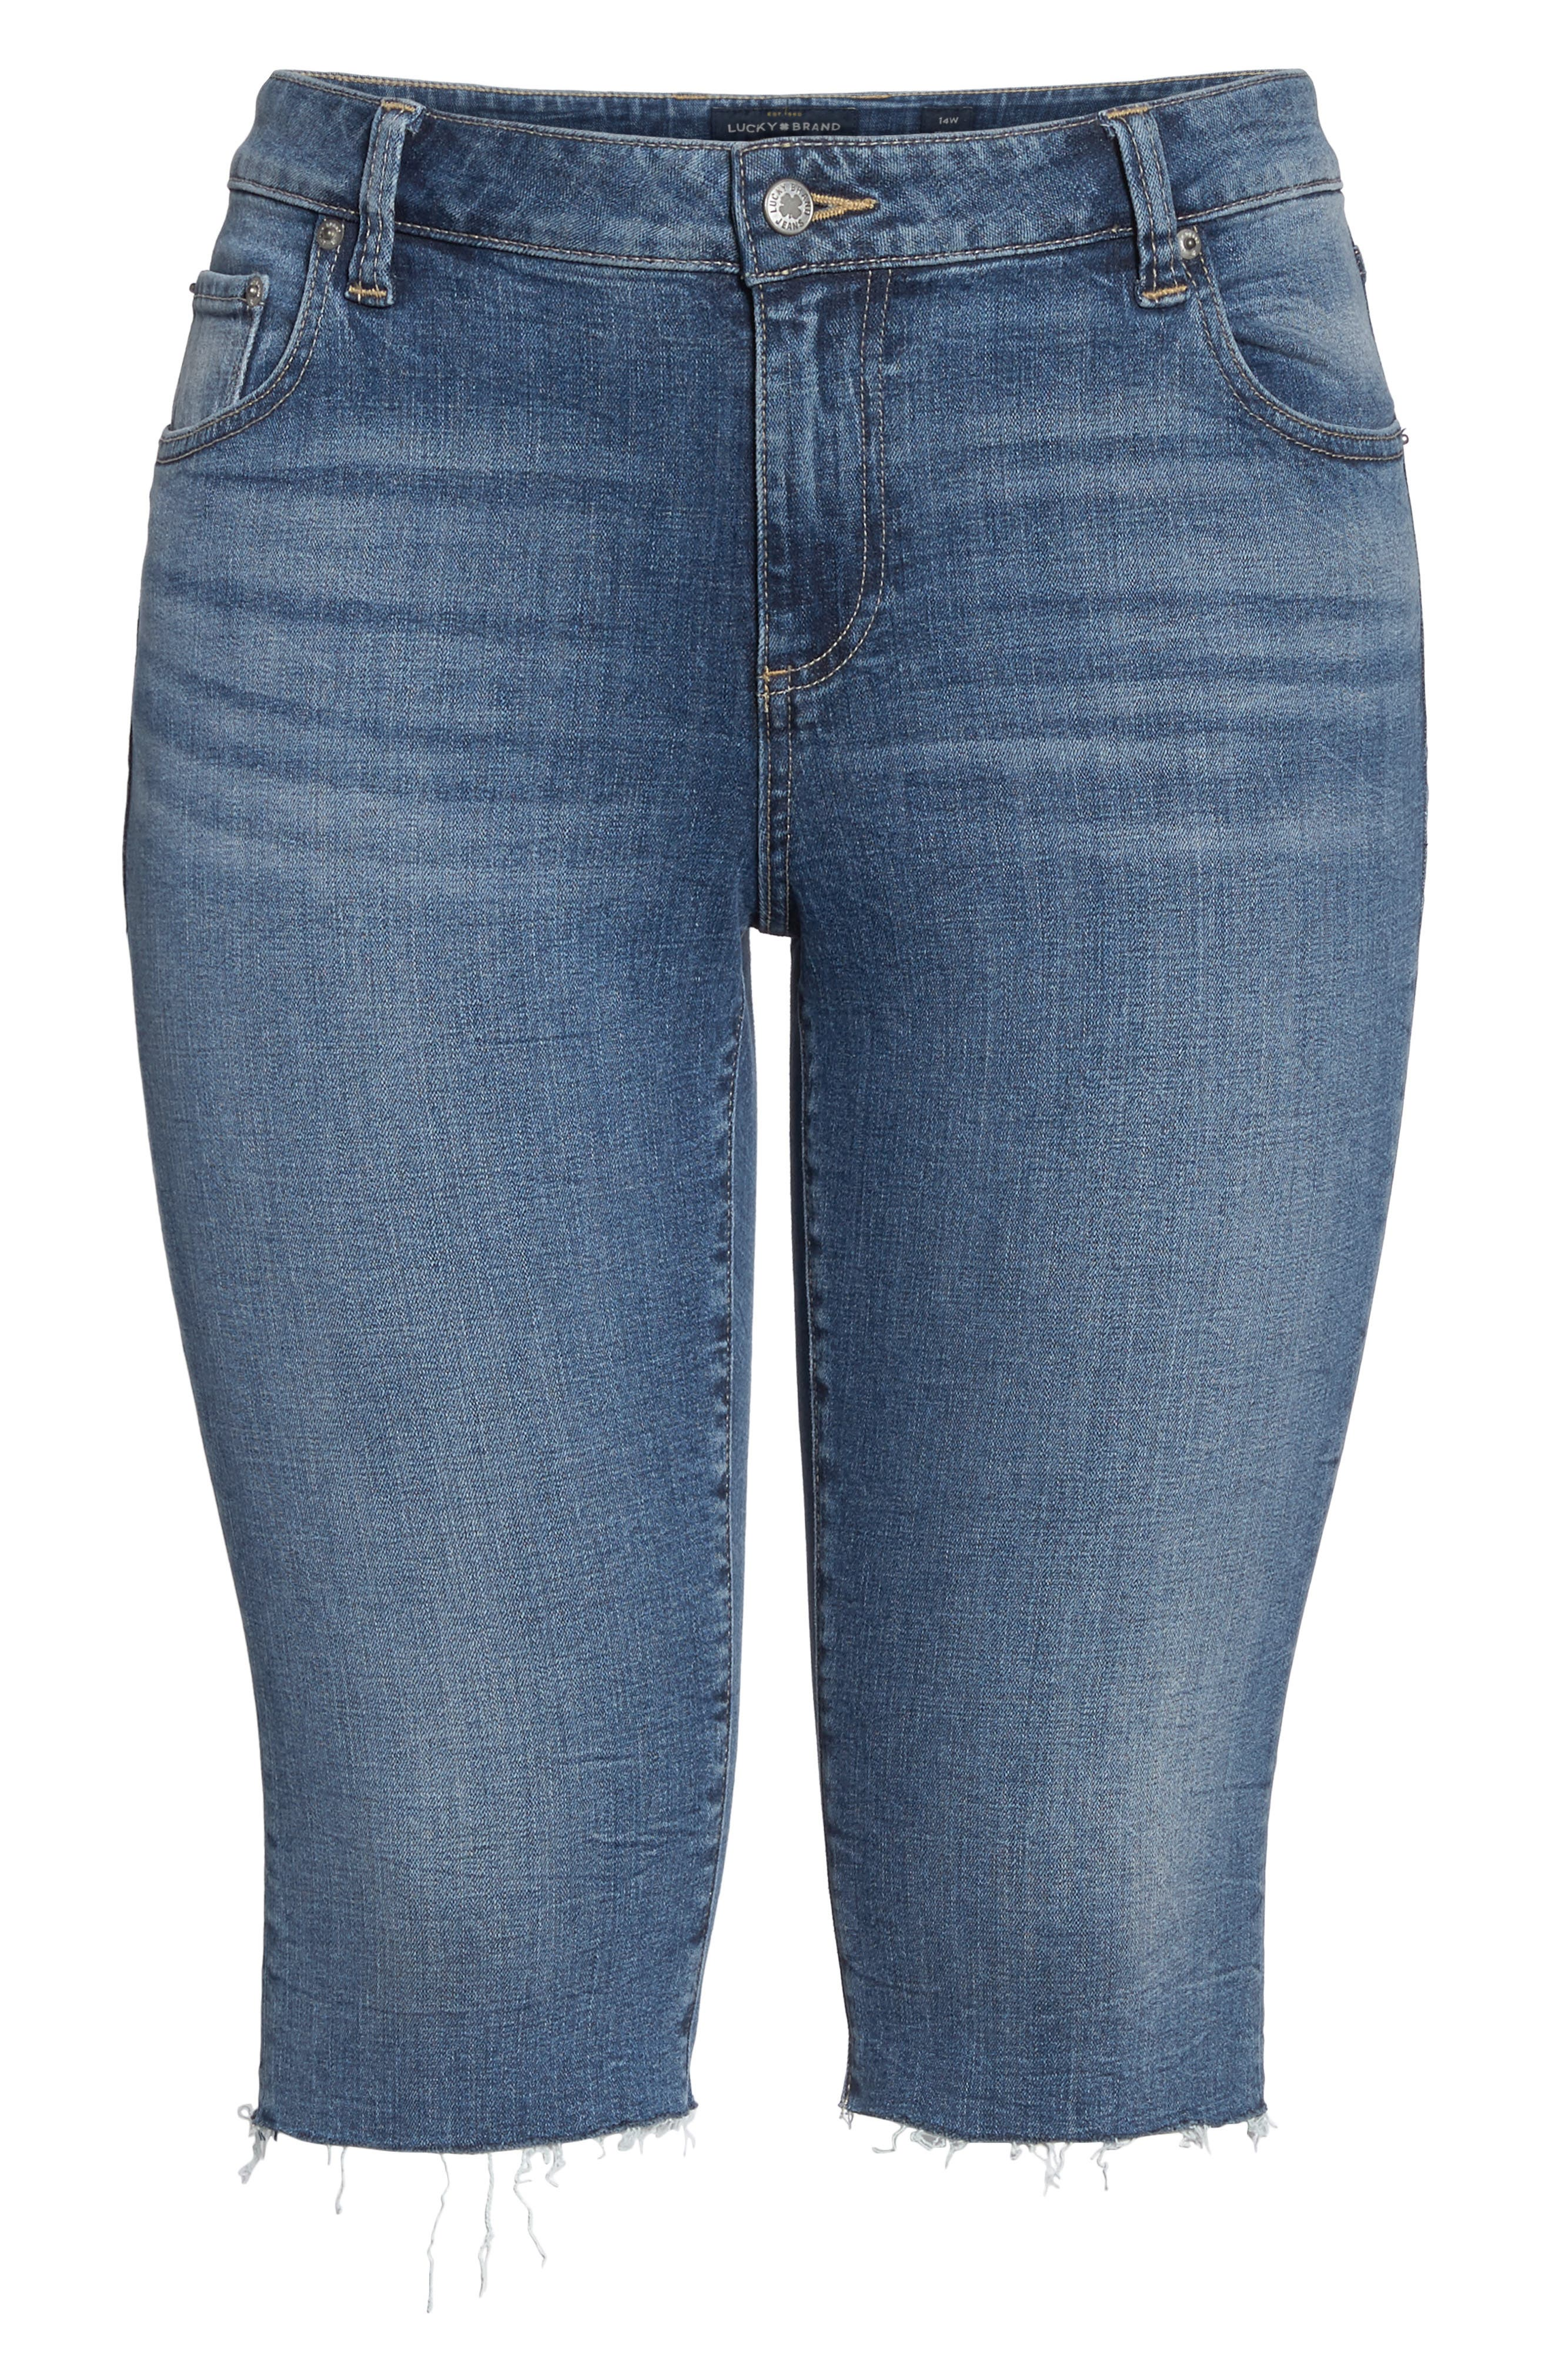 Ginger Bermuda Shorts,                             Alternate thumbnail 6, color,                             430